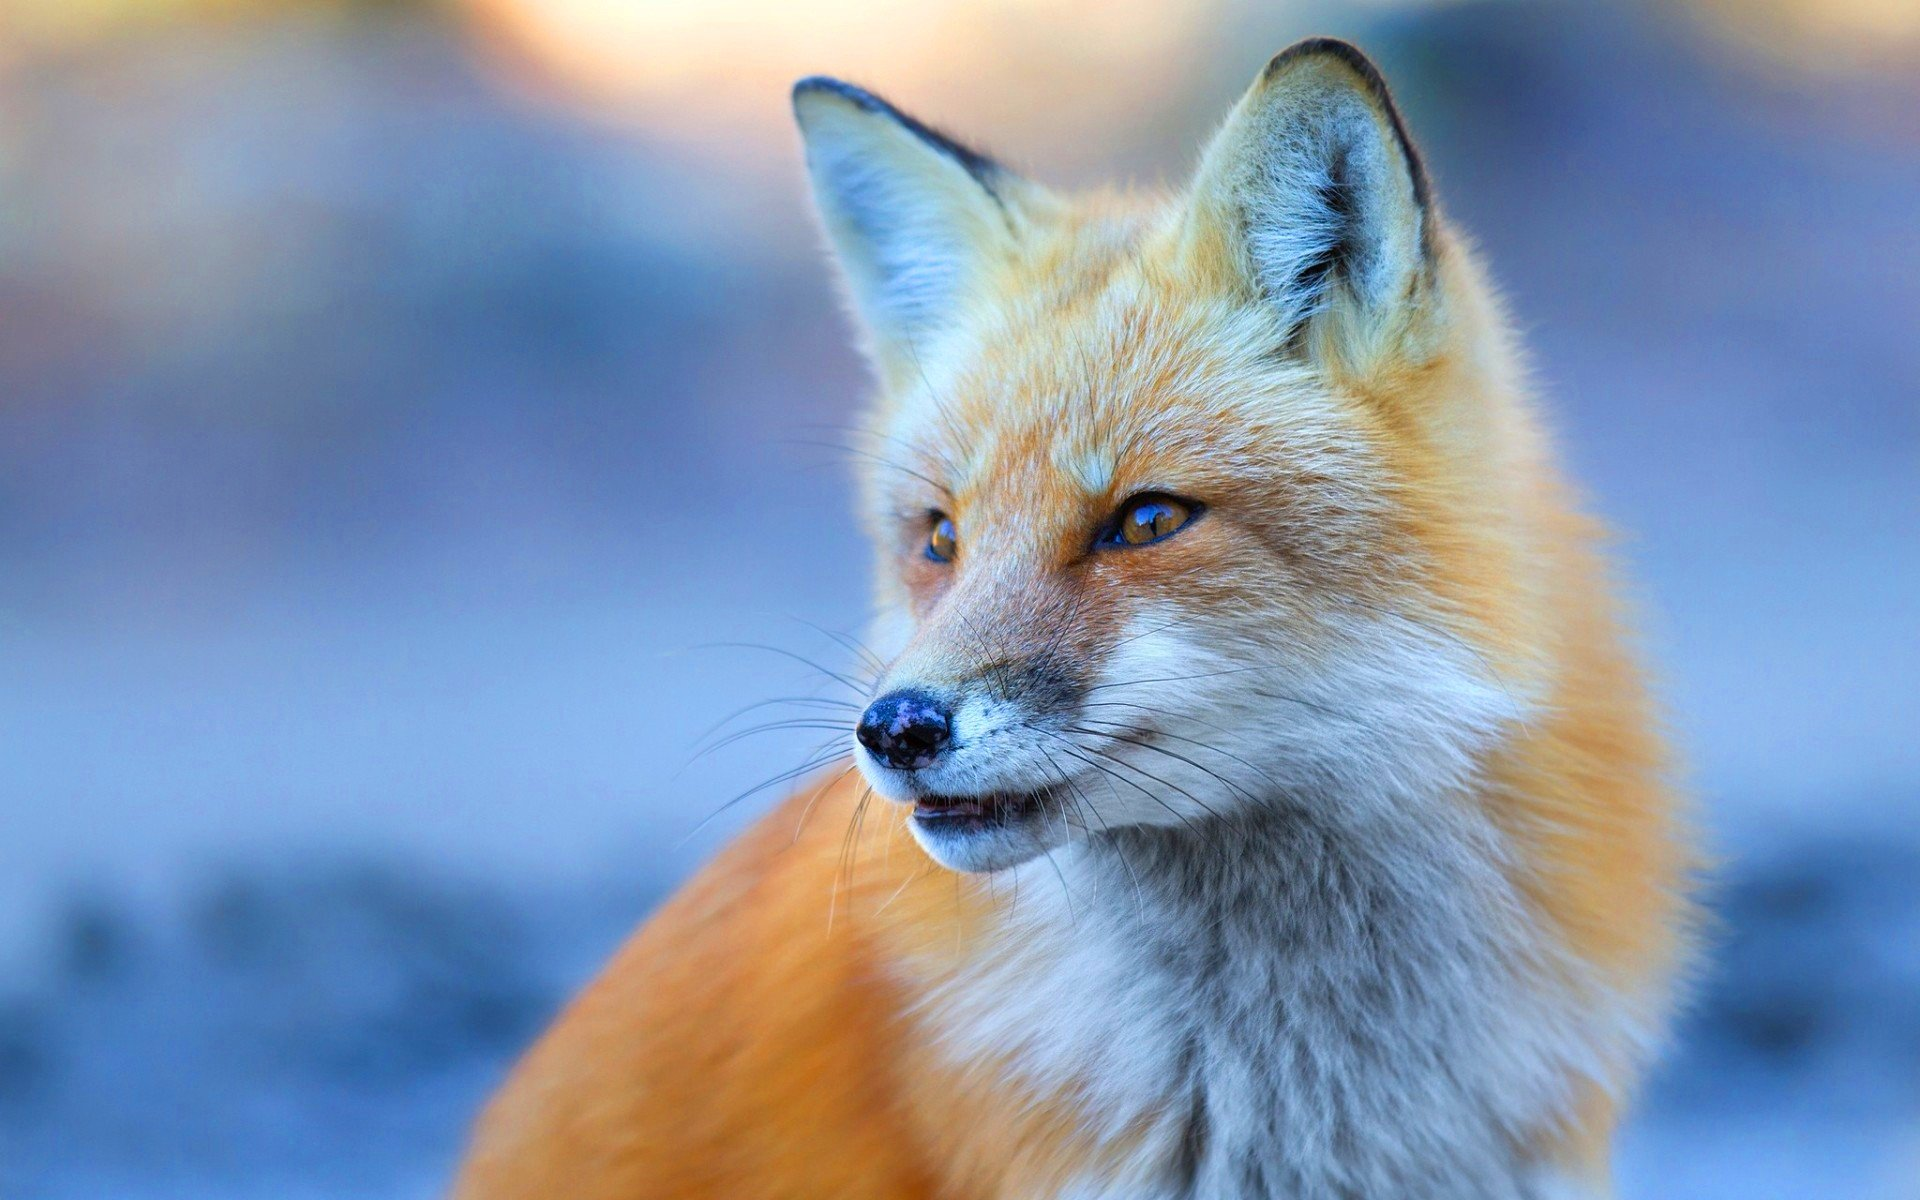 Cute Fox Wallpaper - WallpaperSafari